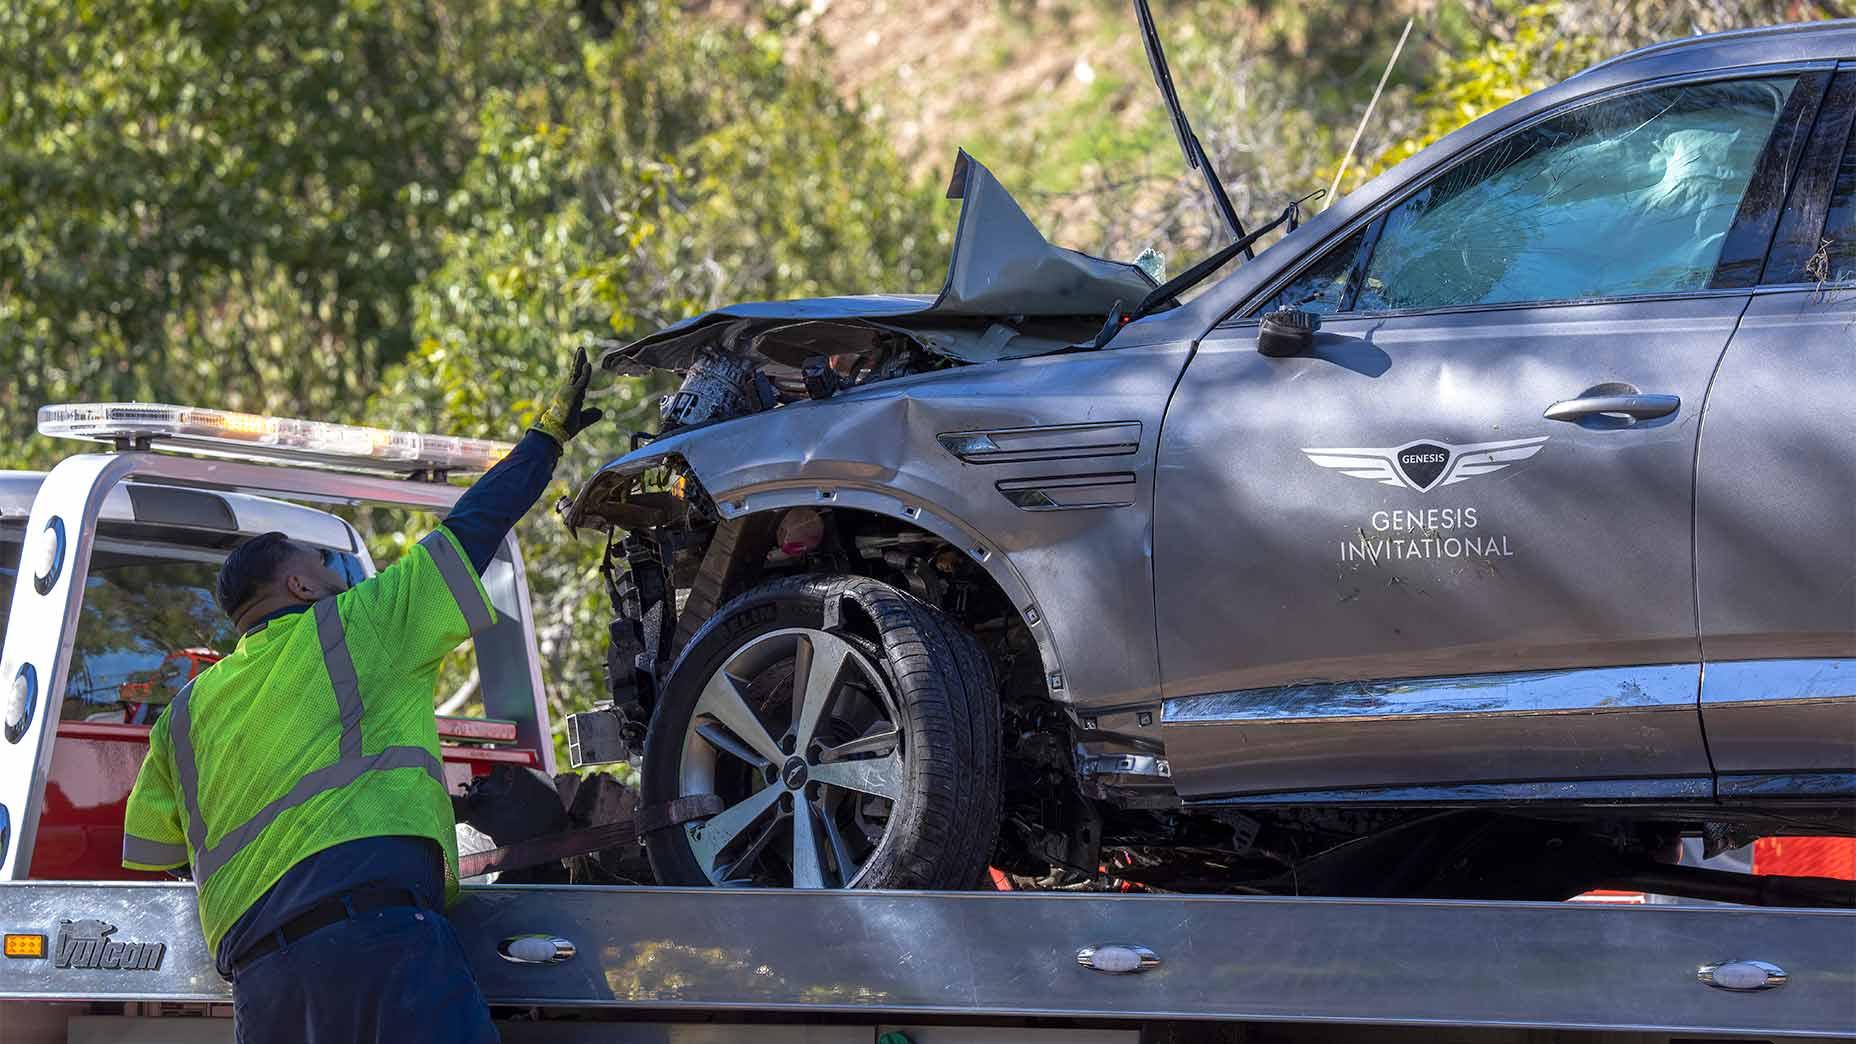 Detectives determine cause of Tiger Woods car crash, won't reveal details